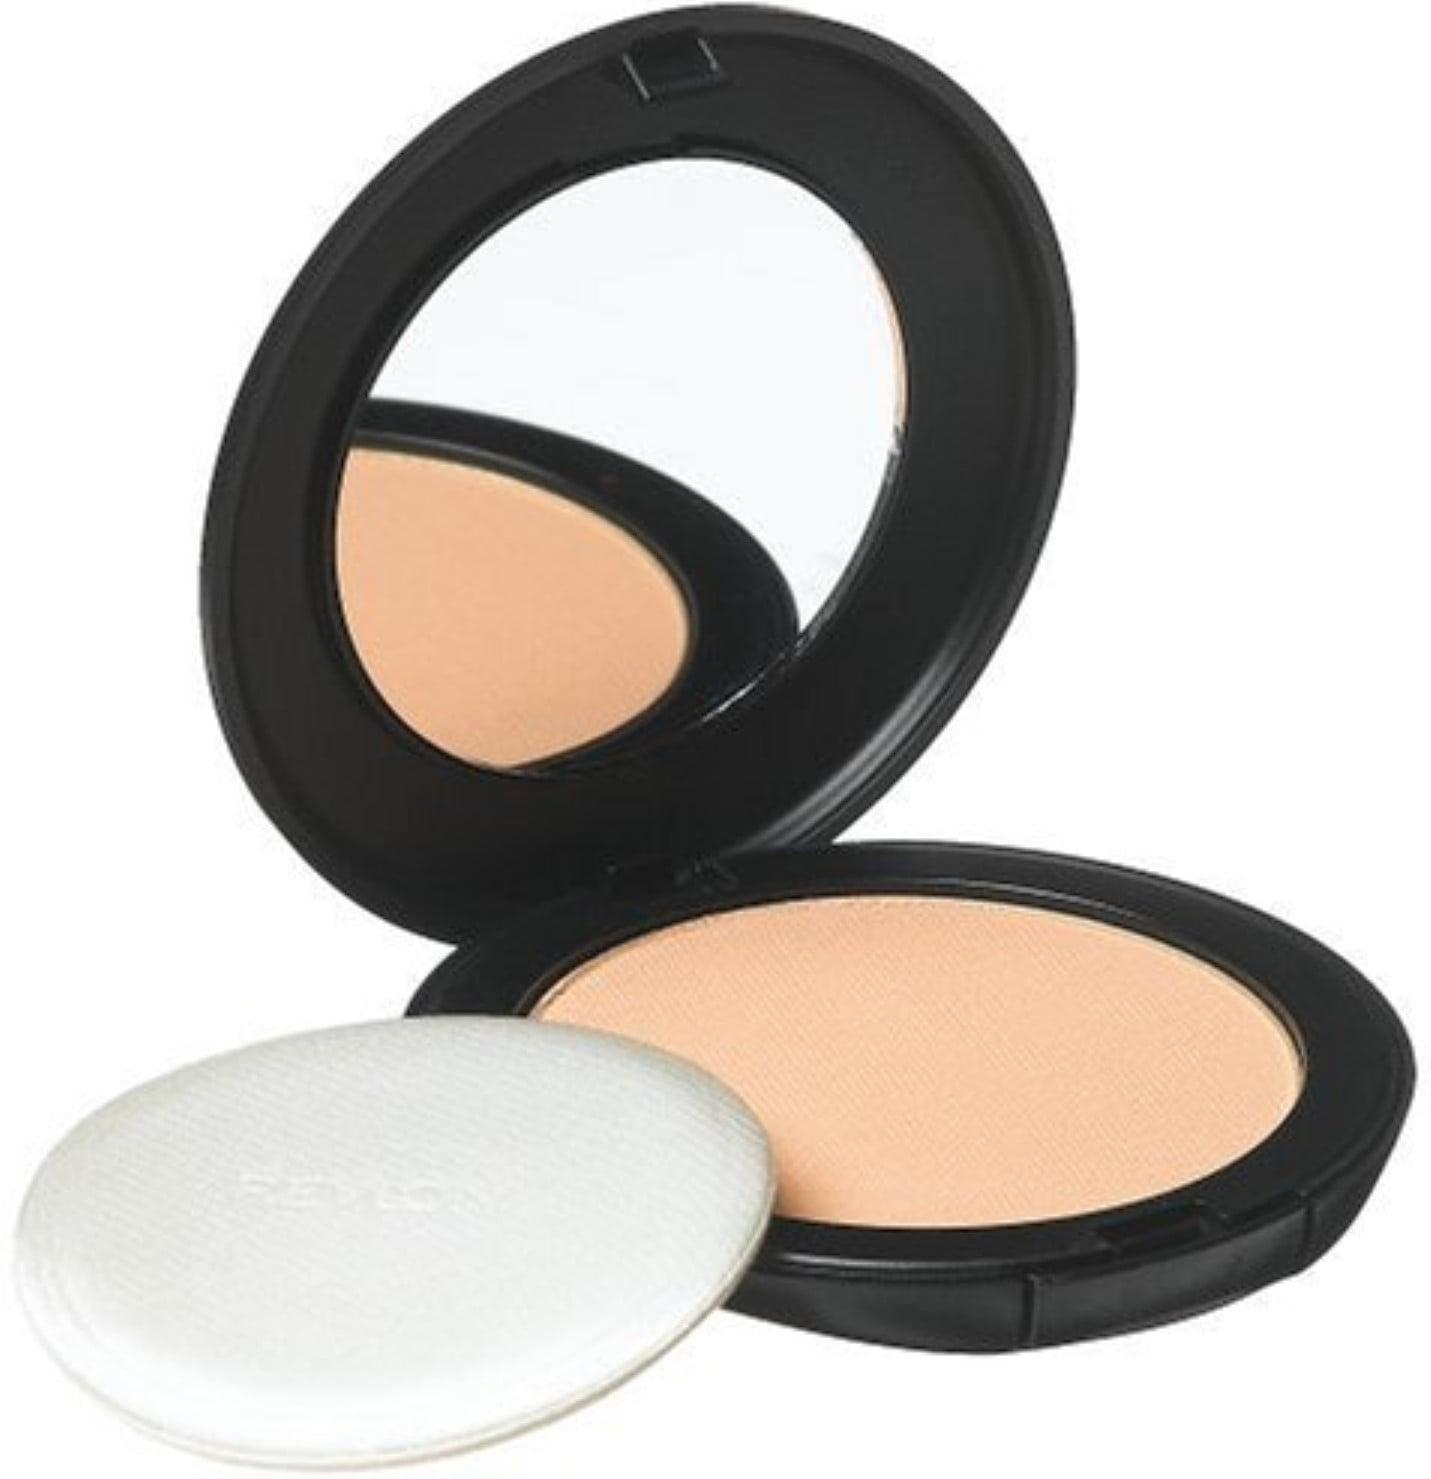 Revlon ColorStay Pressed Powder, Medium [840] 0.3 oz